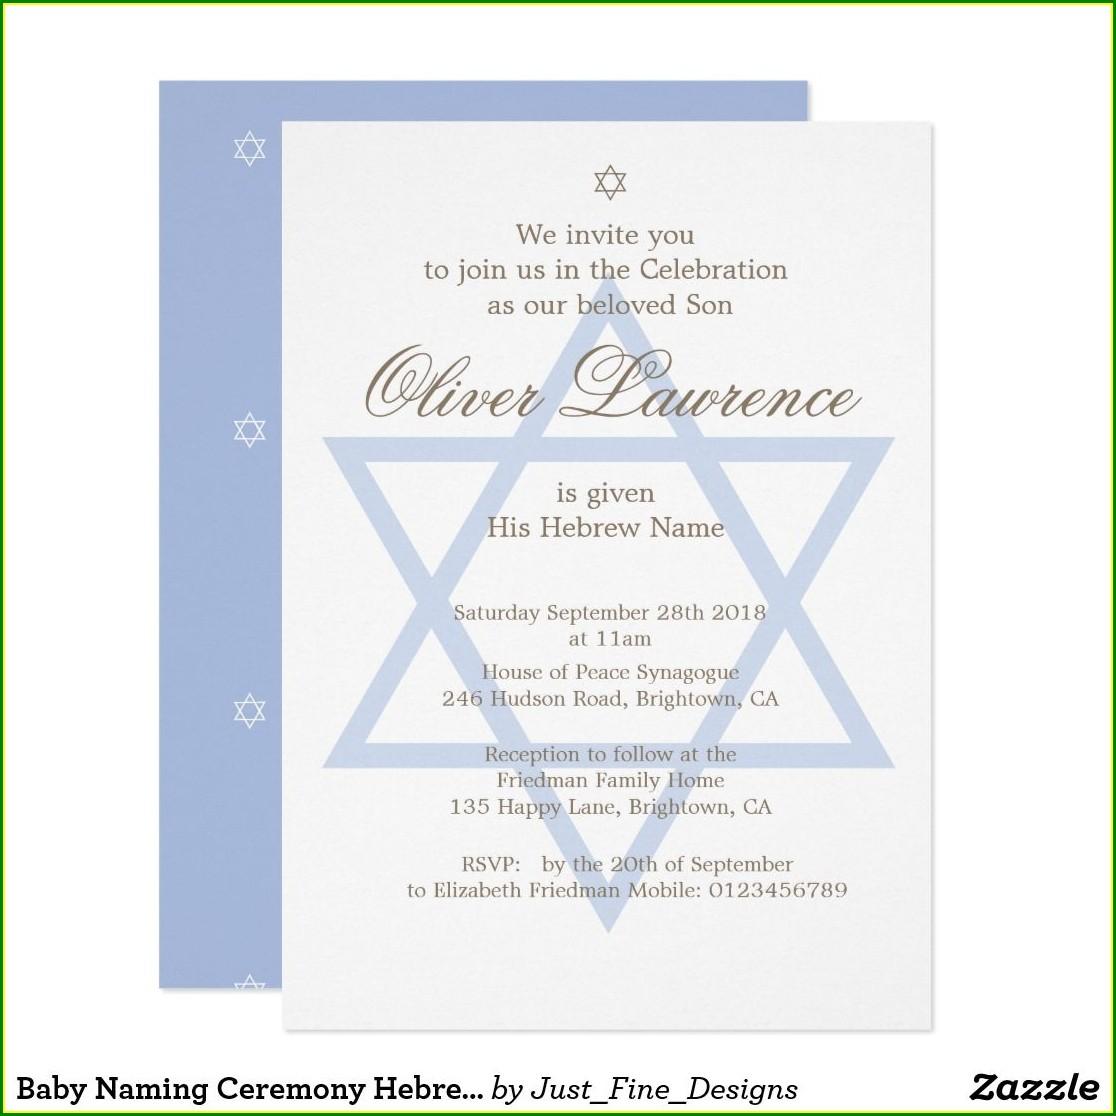 Baby Naming Ceremony Invitation Quotes